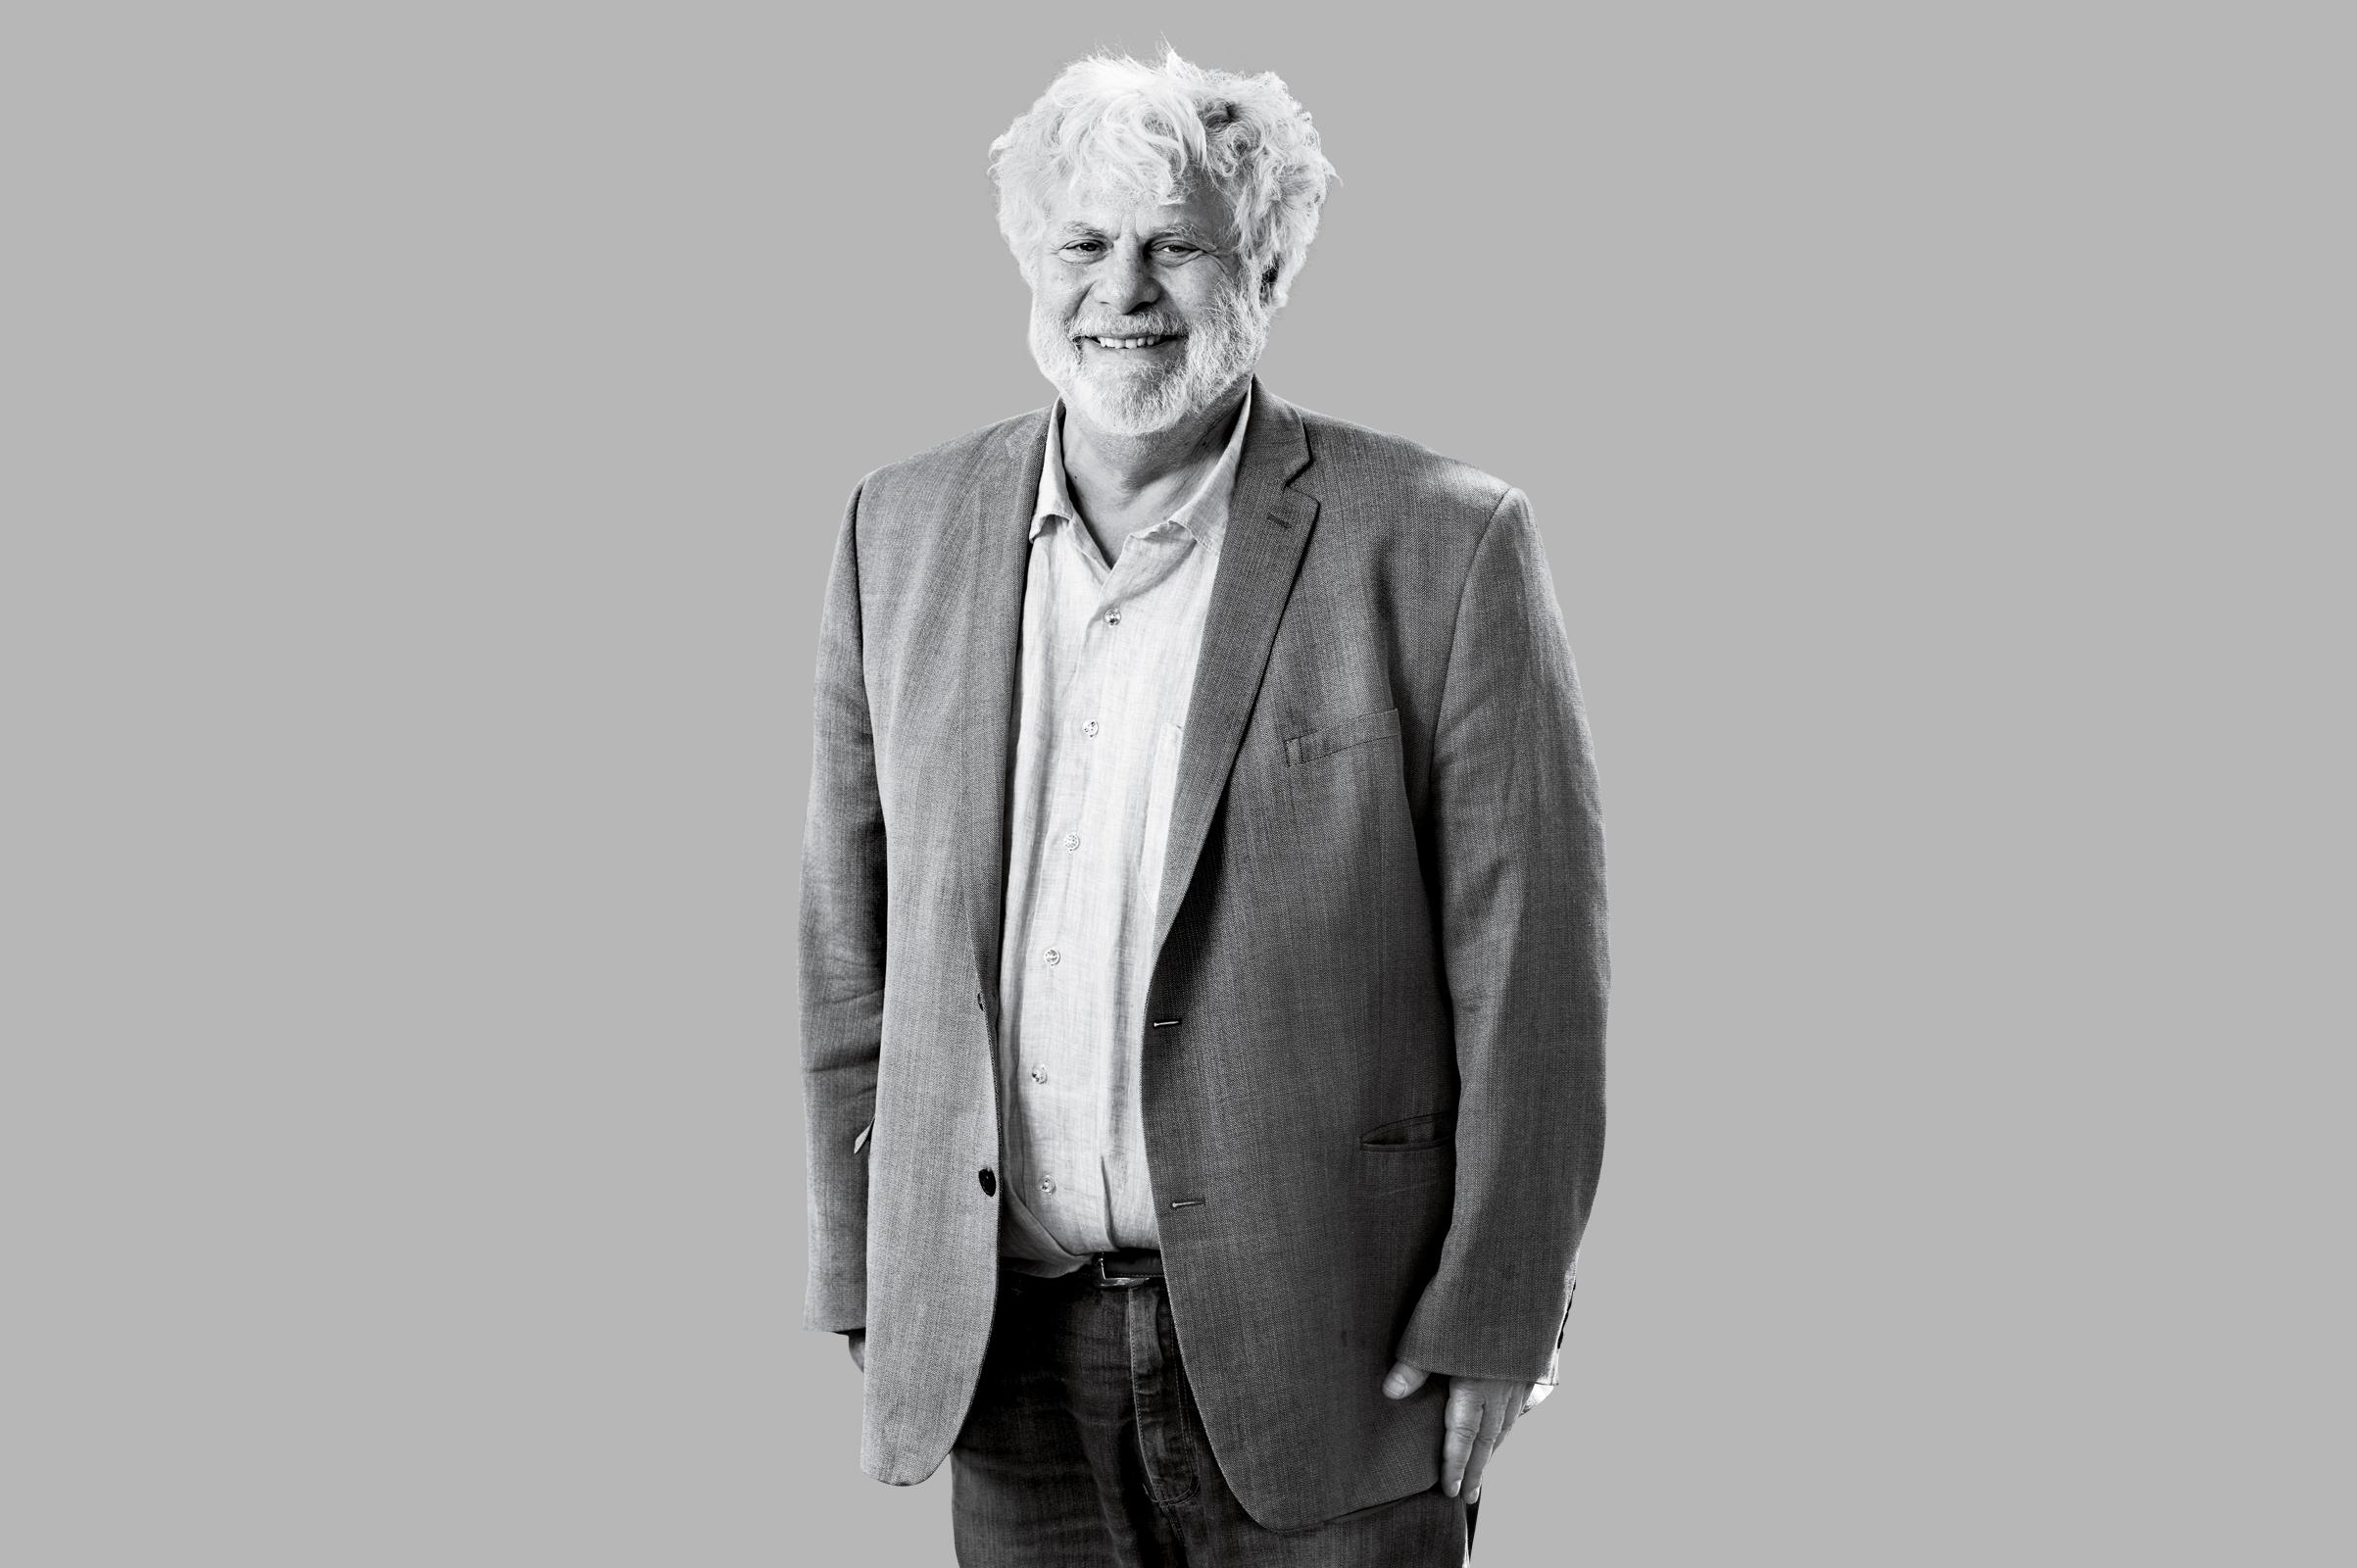 American journalist and writer Mark Kurlansky attends a photocall at Edinburgh International Book Festival at Charlotte Square Gardens on August 17, 2016 in Edinburgh, Scotland.